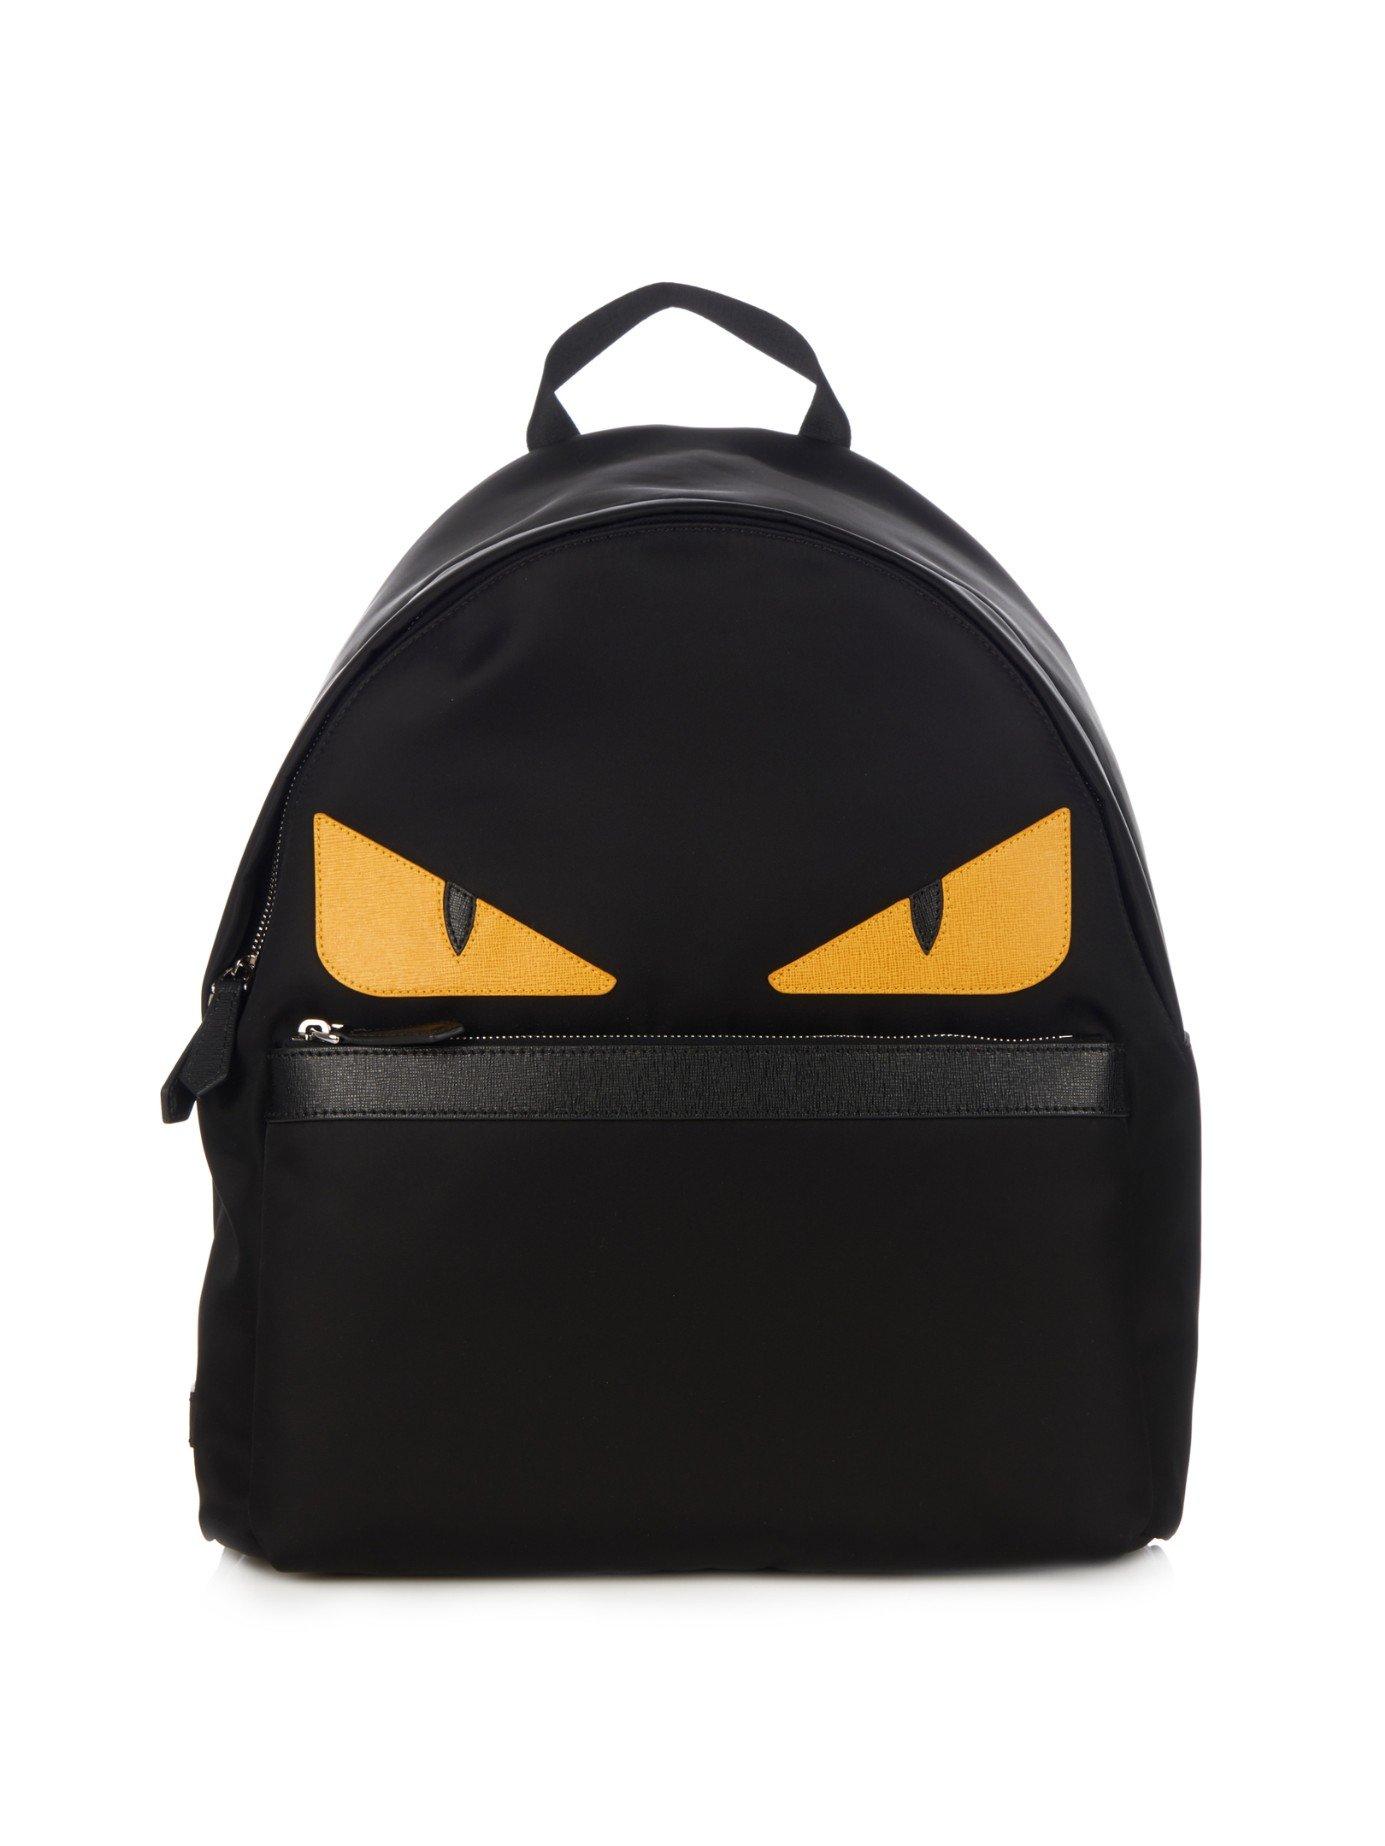 Fendi Bag Bugs Nylon And Leather Backpack In Black For Men